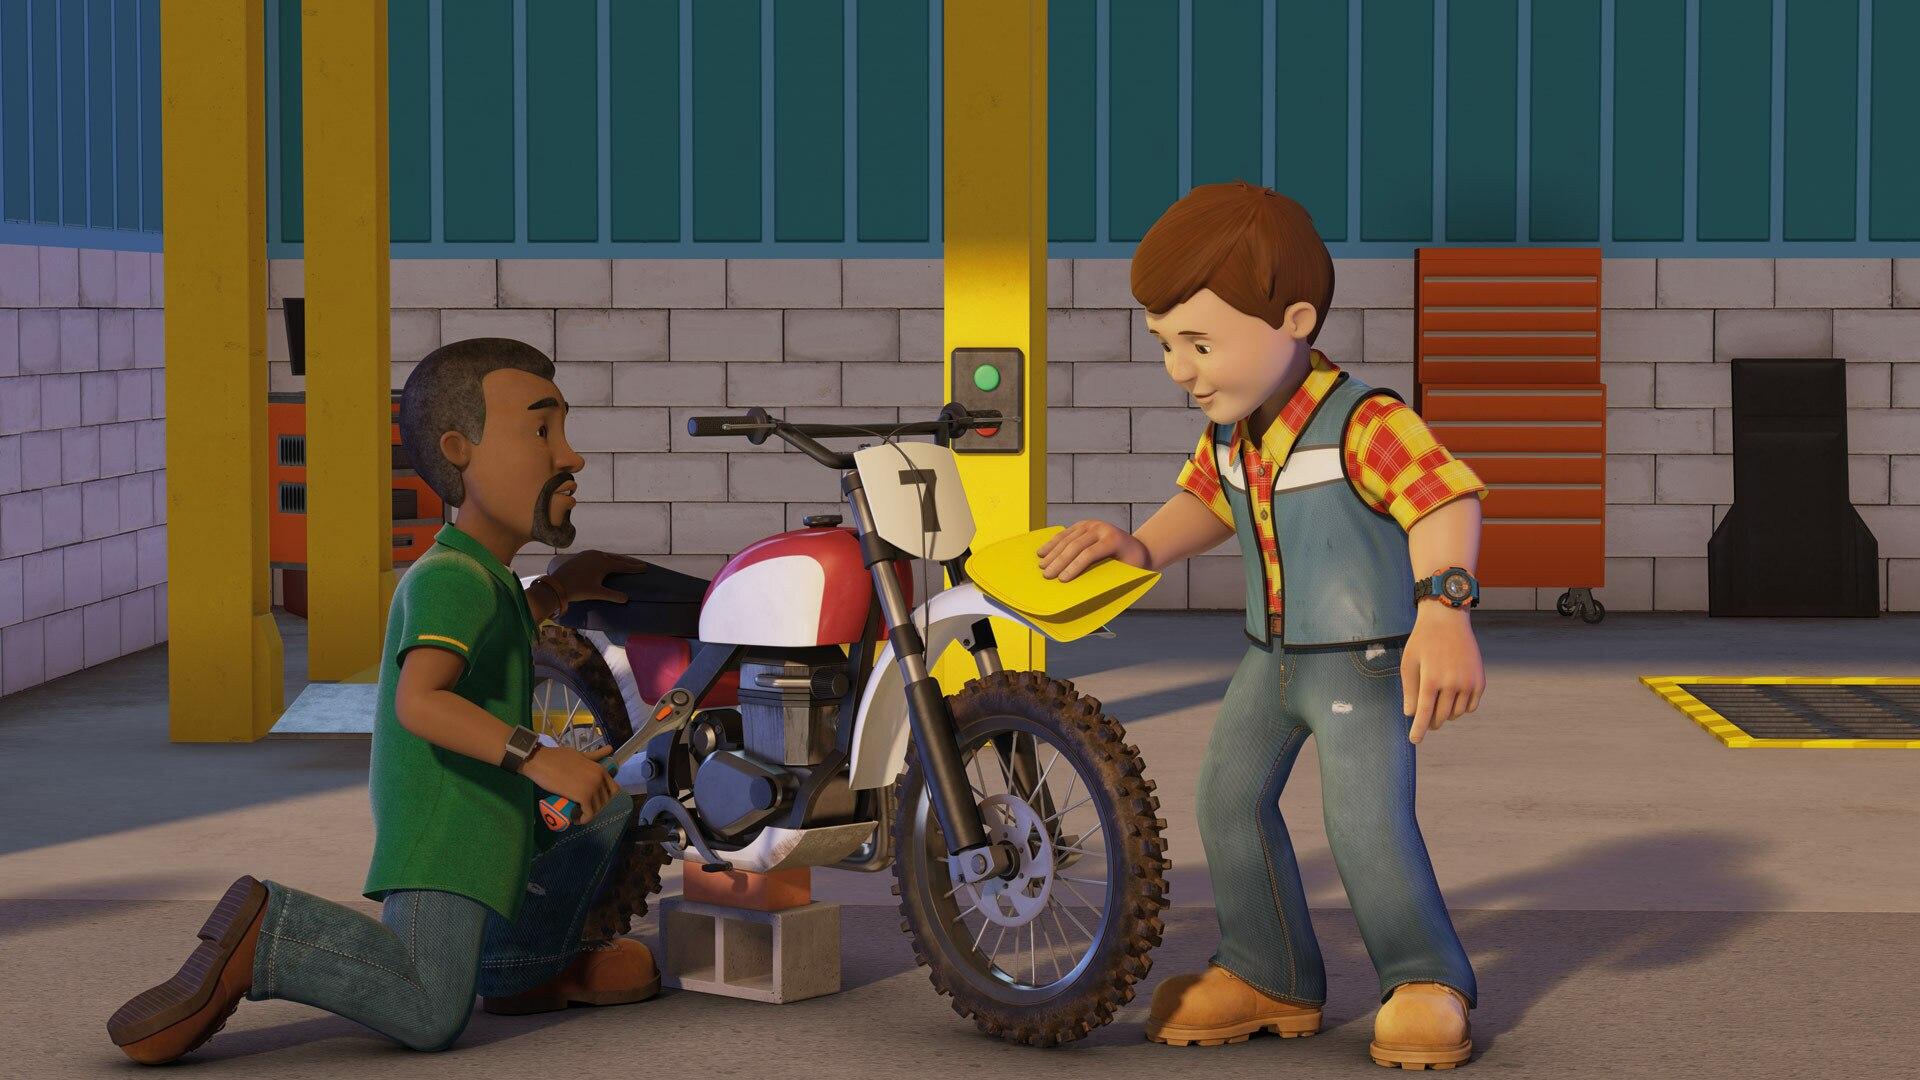 Bob and the Masked Rider